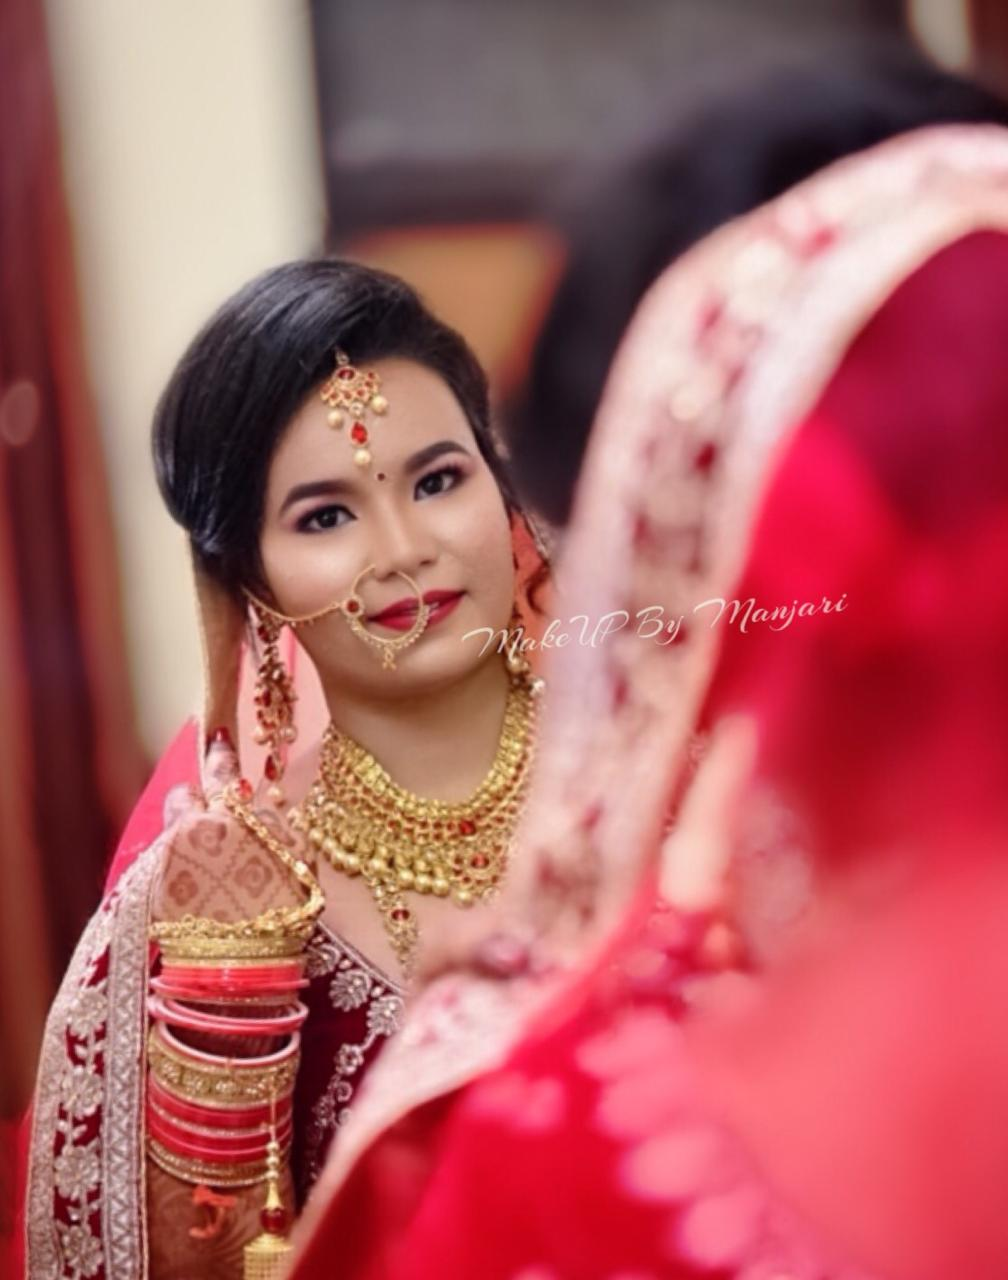 manjari-makeup-artist-kanpur